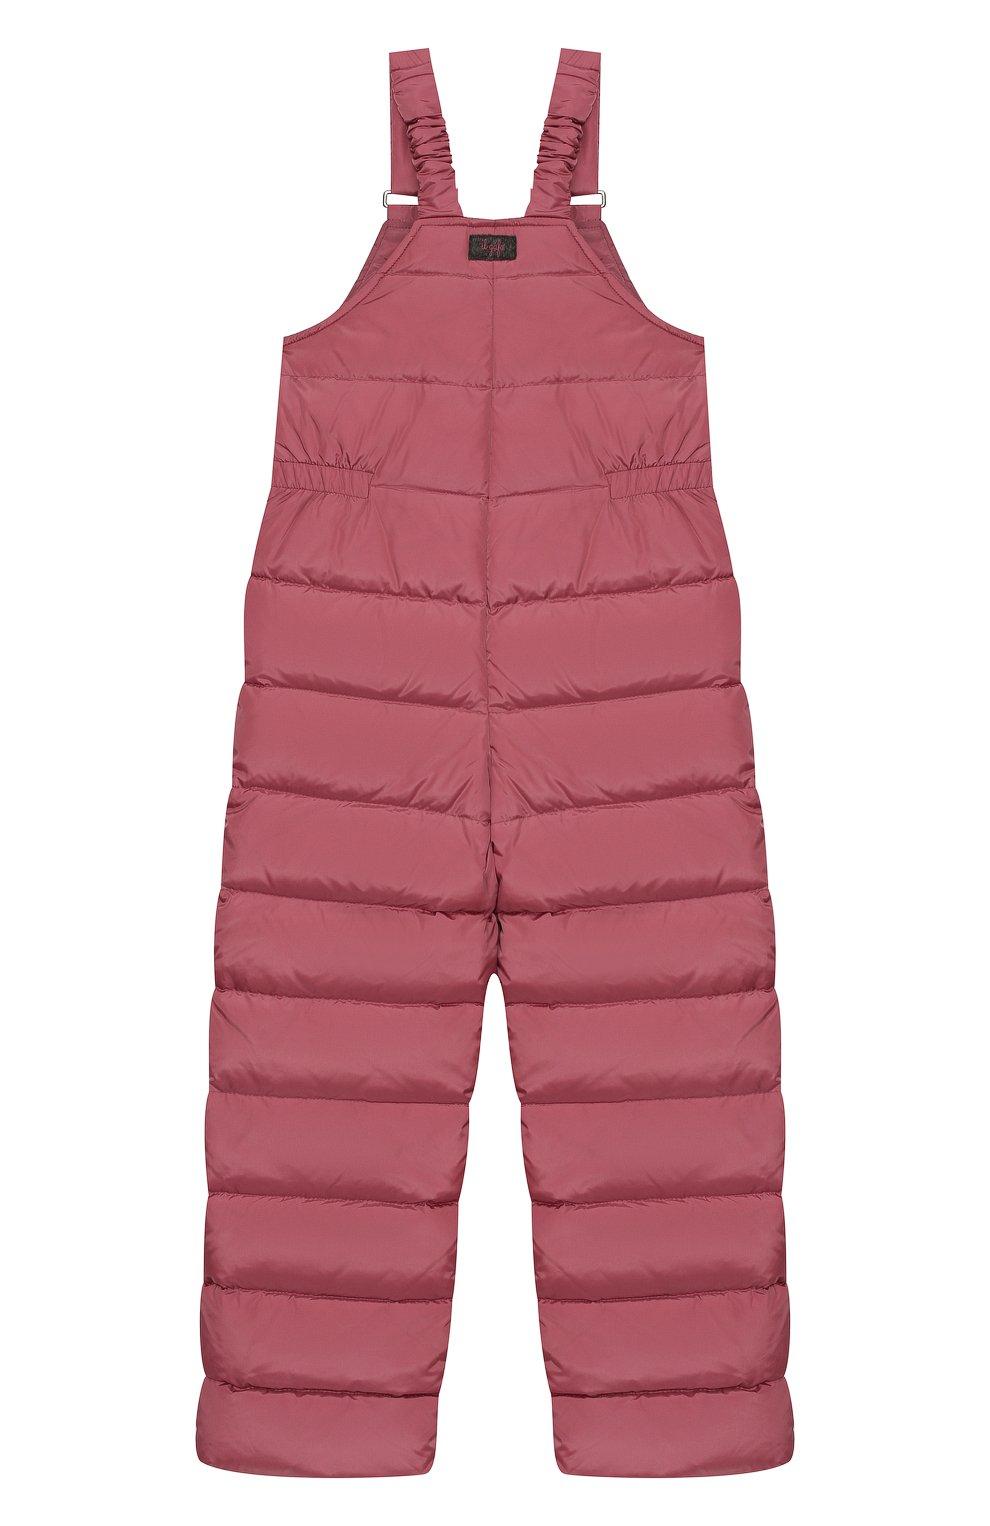 Детский пуховый комбинезон IL GUFO розового цвета, арт. A19ST007N0031/10A-12A | Фото 2